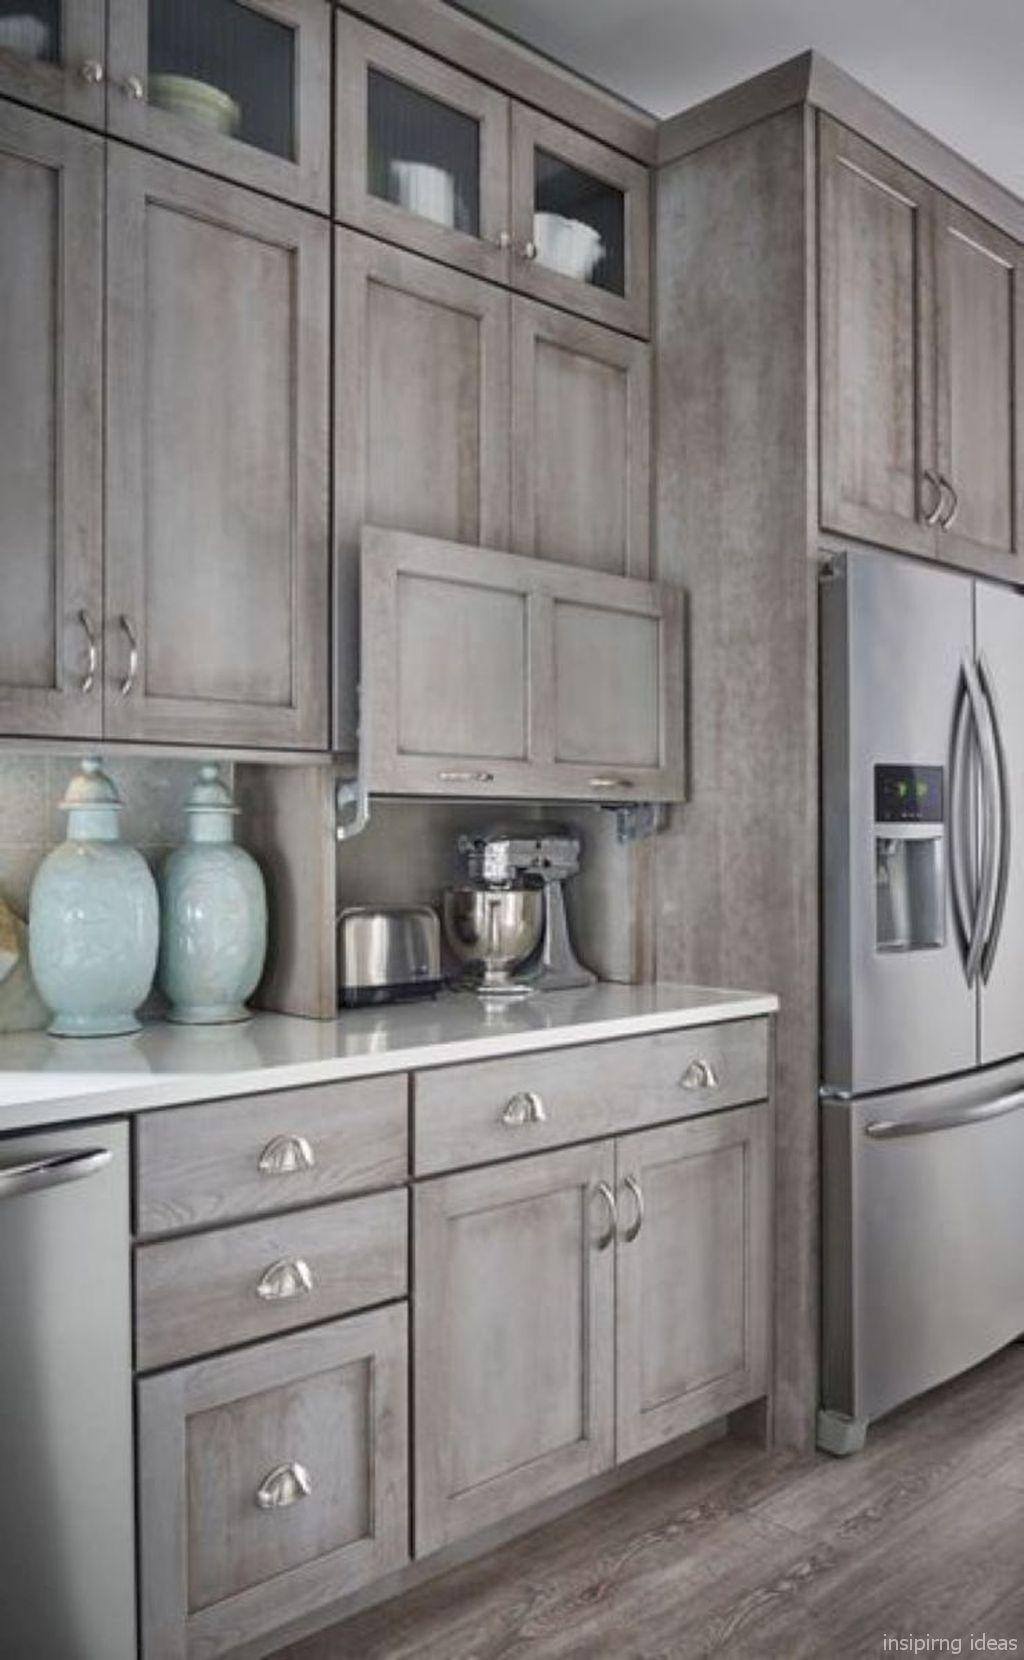 cool 70 beautiful farmhouse style kitchen decor ideas https roomaholic com 2847 70 beautif on kitchen cabinets rustic farmhouse style id=66728